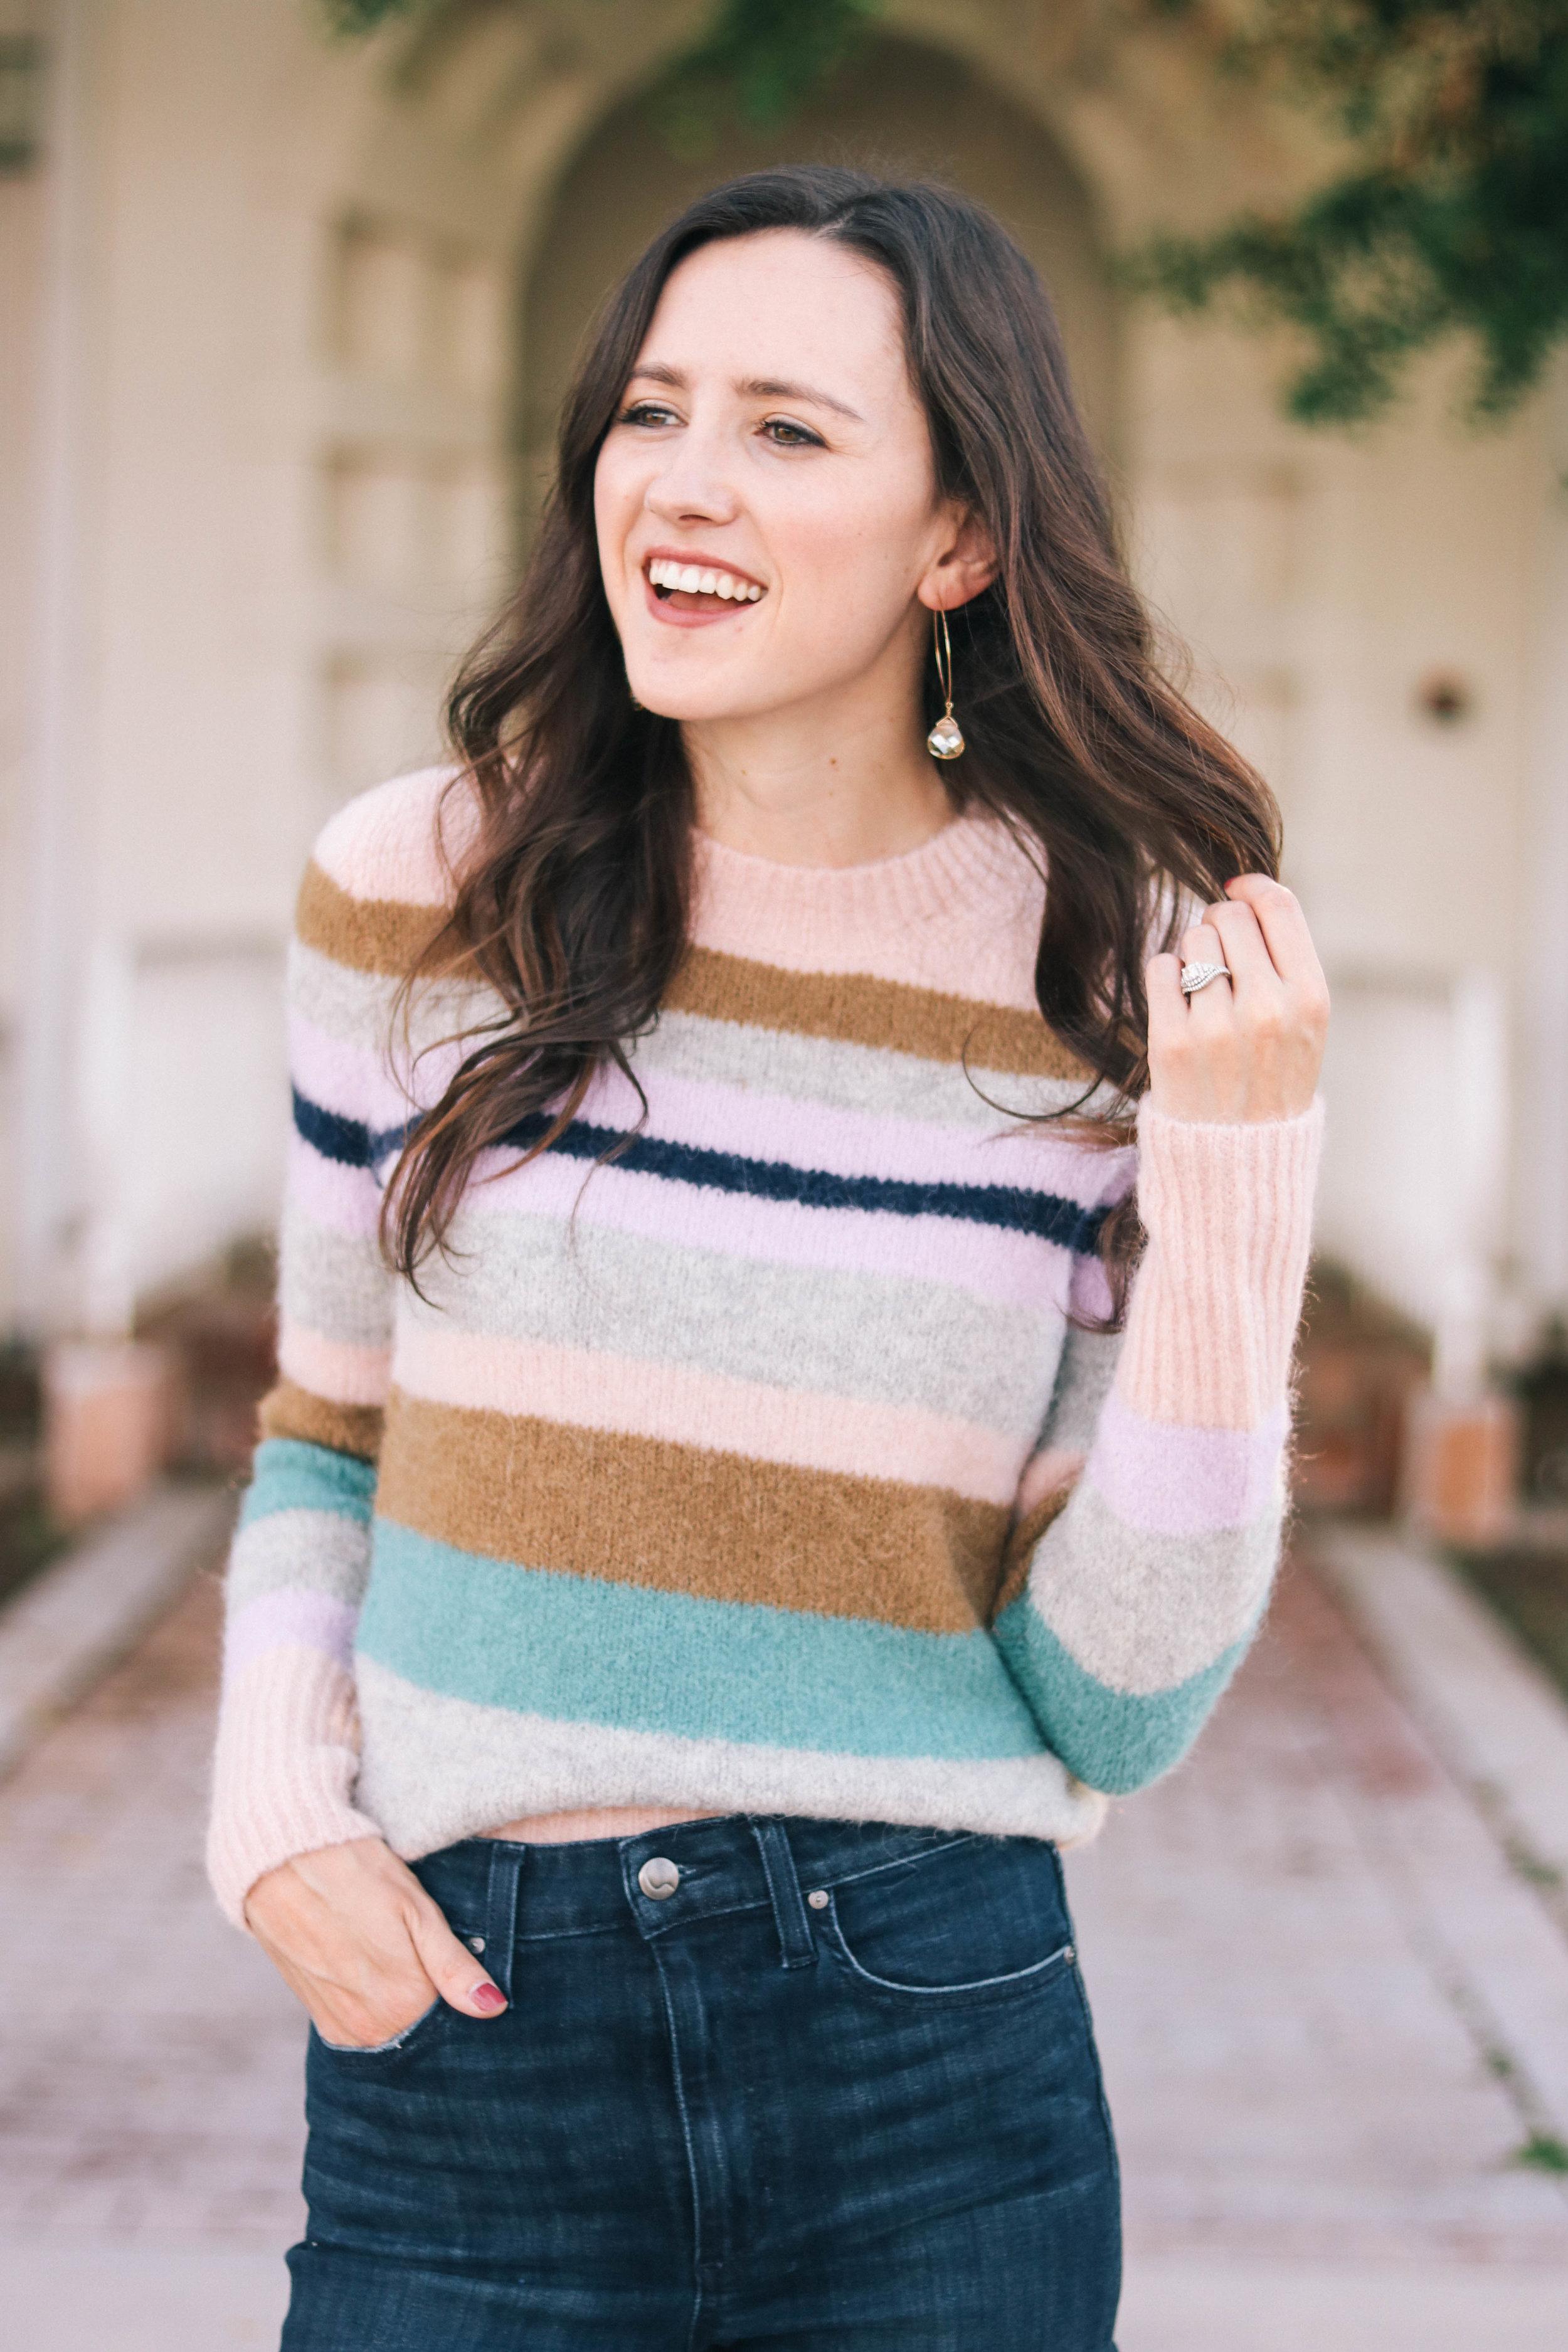 bb-striped-sweater-008 (1 of 1).jpg